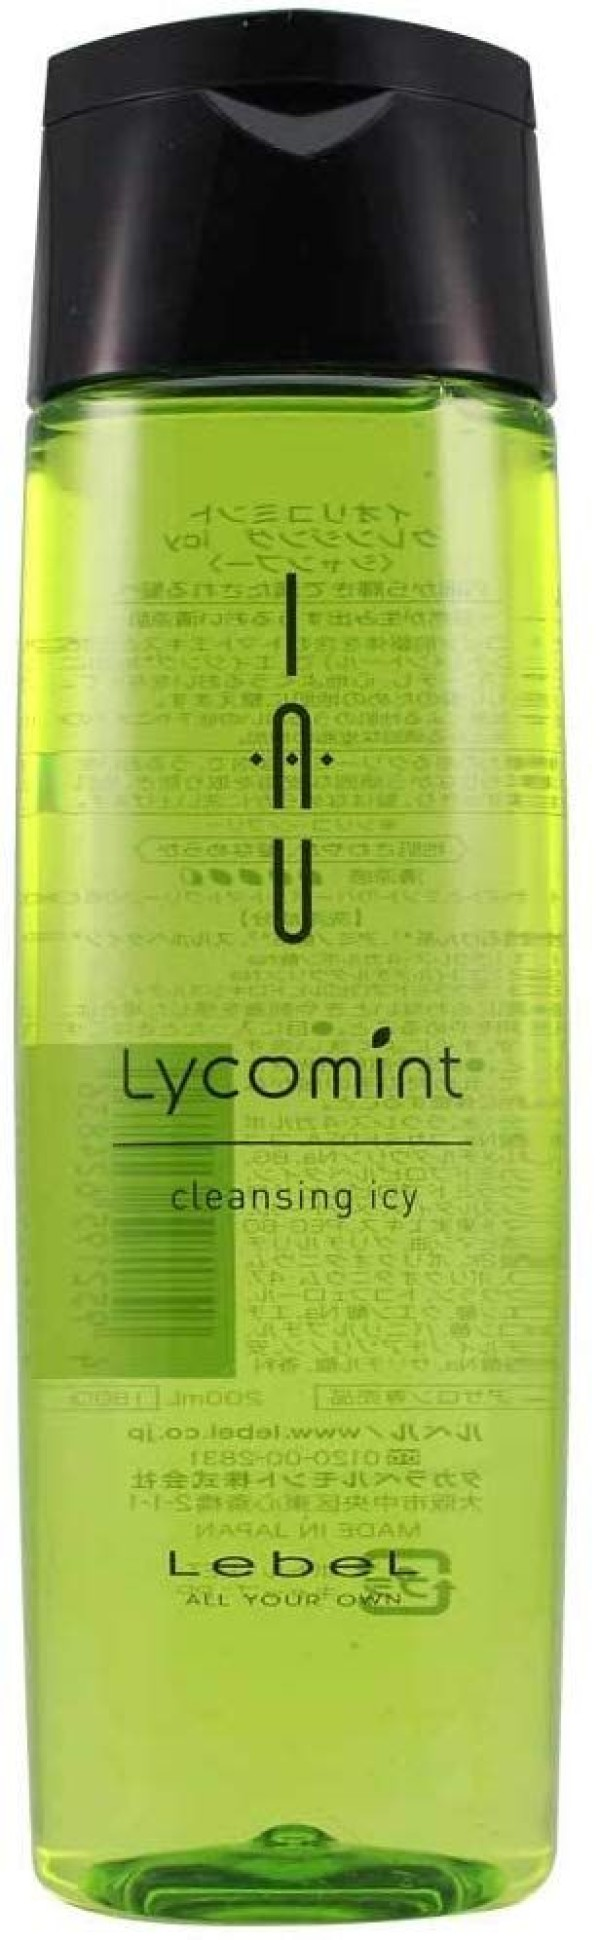 Охлаждающий антиоксидантный шампунь Lebel IAU Lycomint cleansing icy